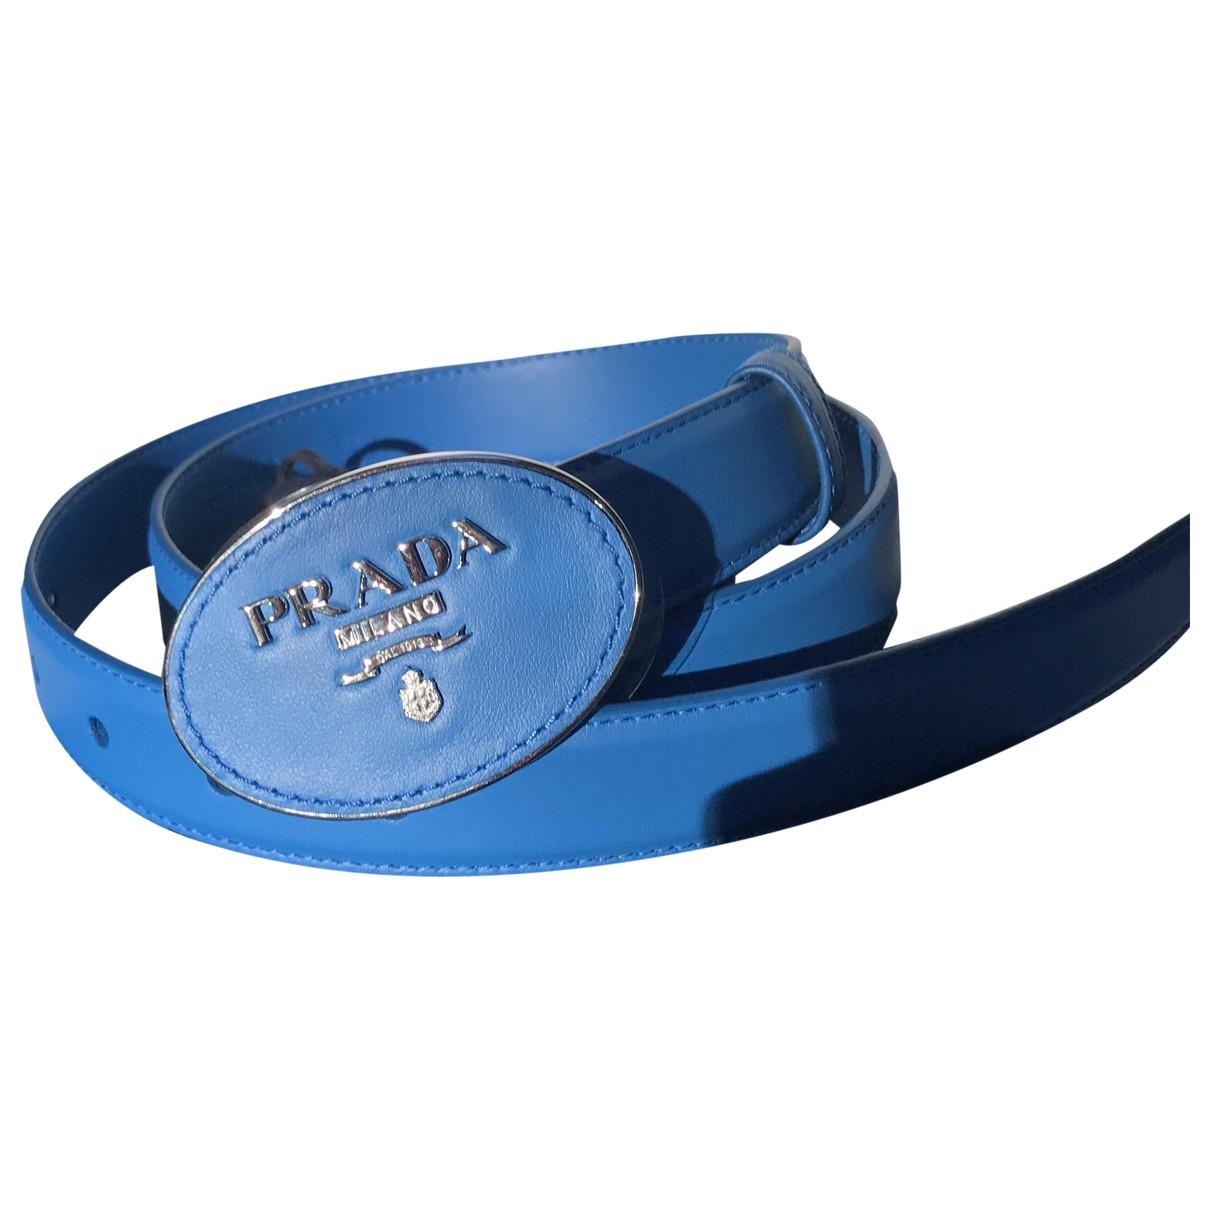 Prada \N Blue Leather belt for Women 80 cm